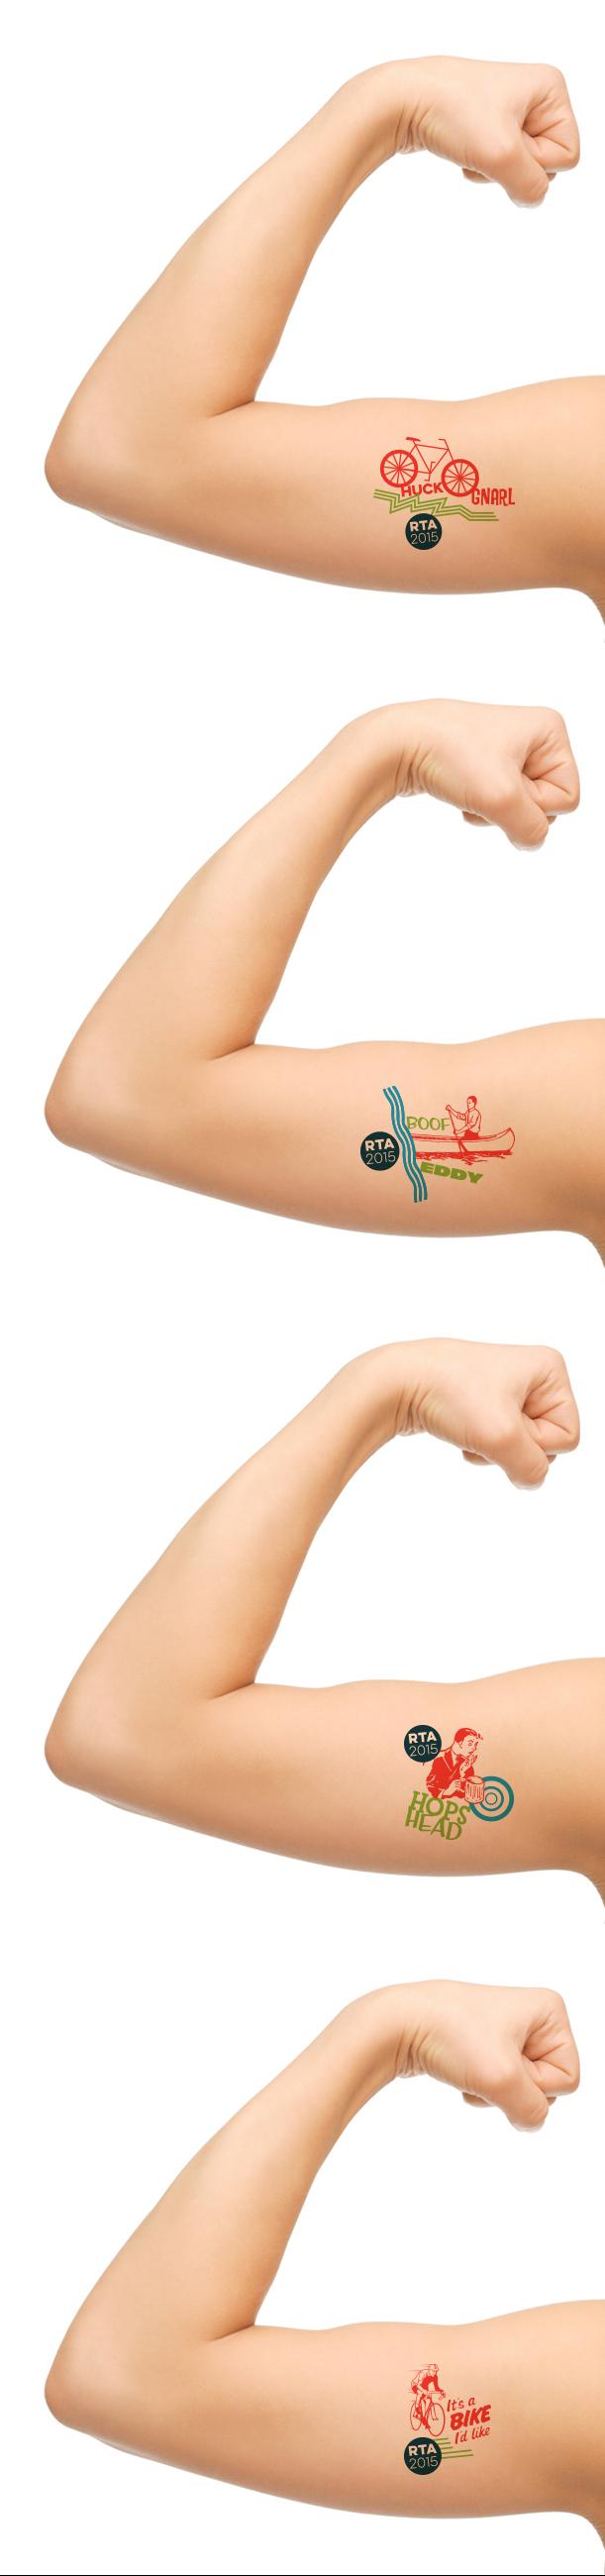 RTA2015_Tattoos_Portfolio.jpg